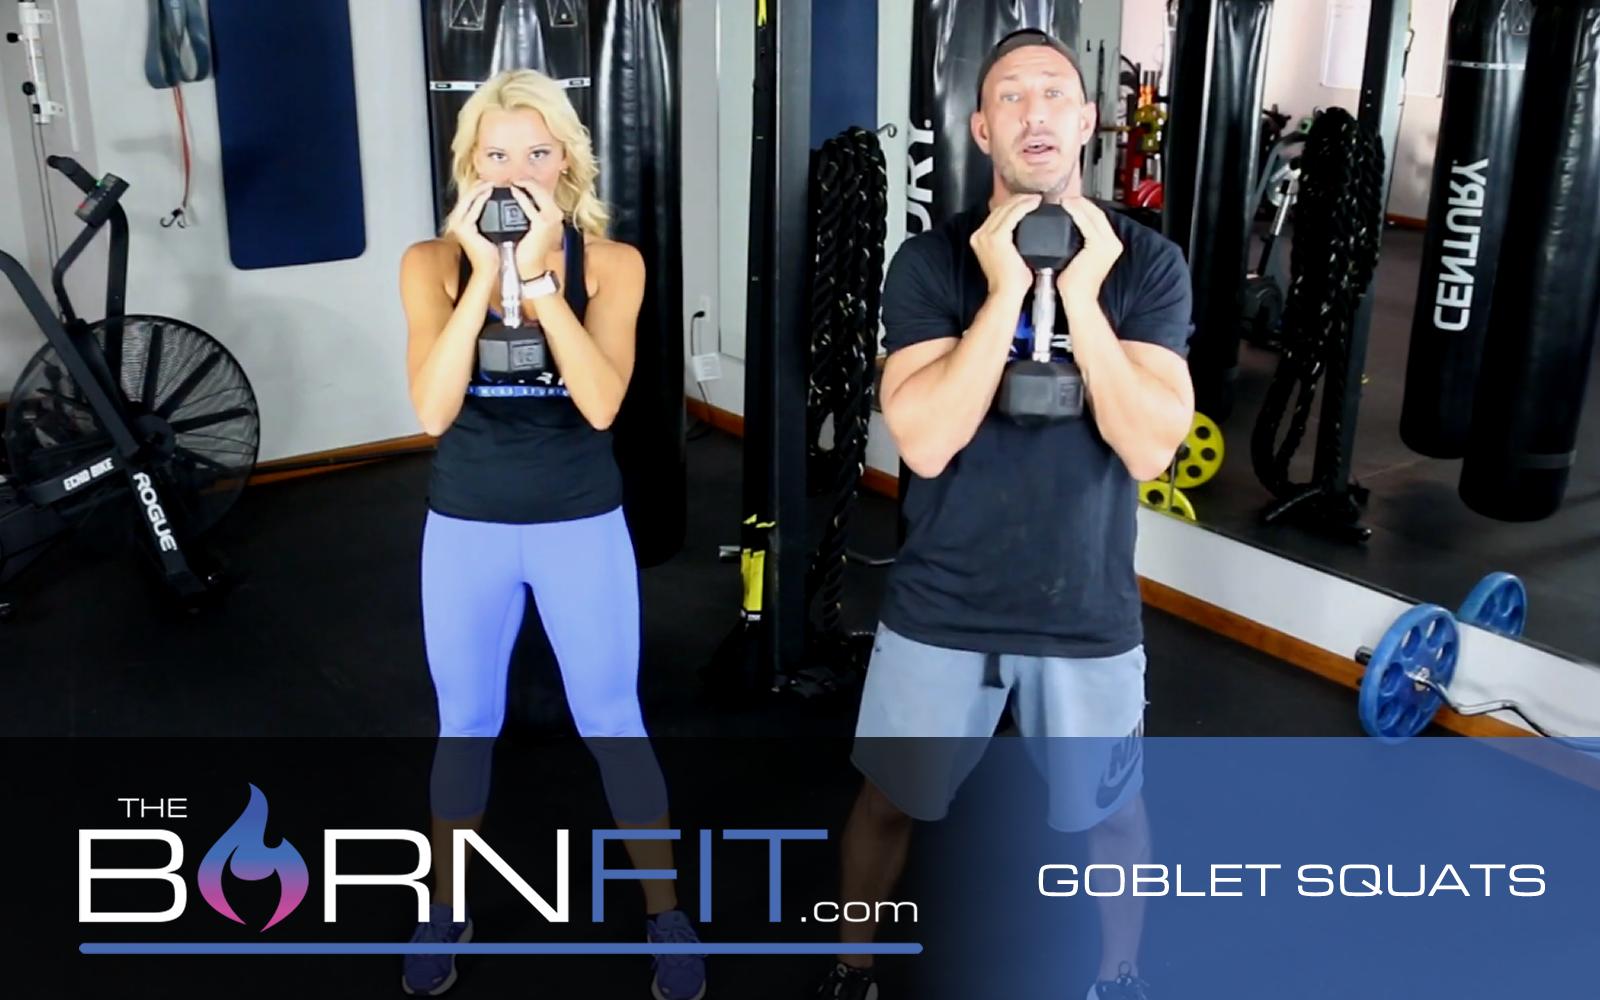 Goblet Squats workouts